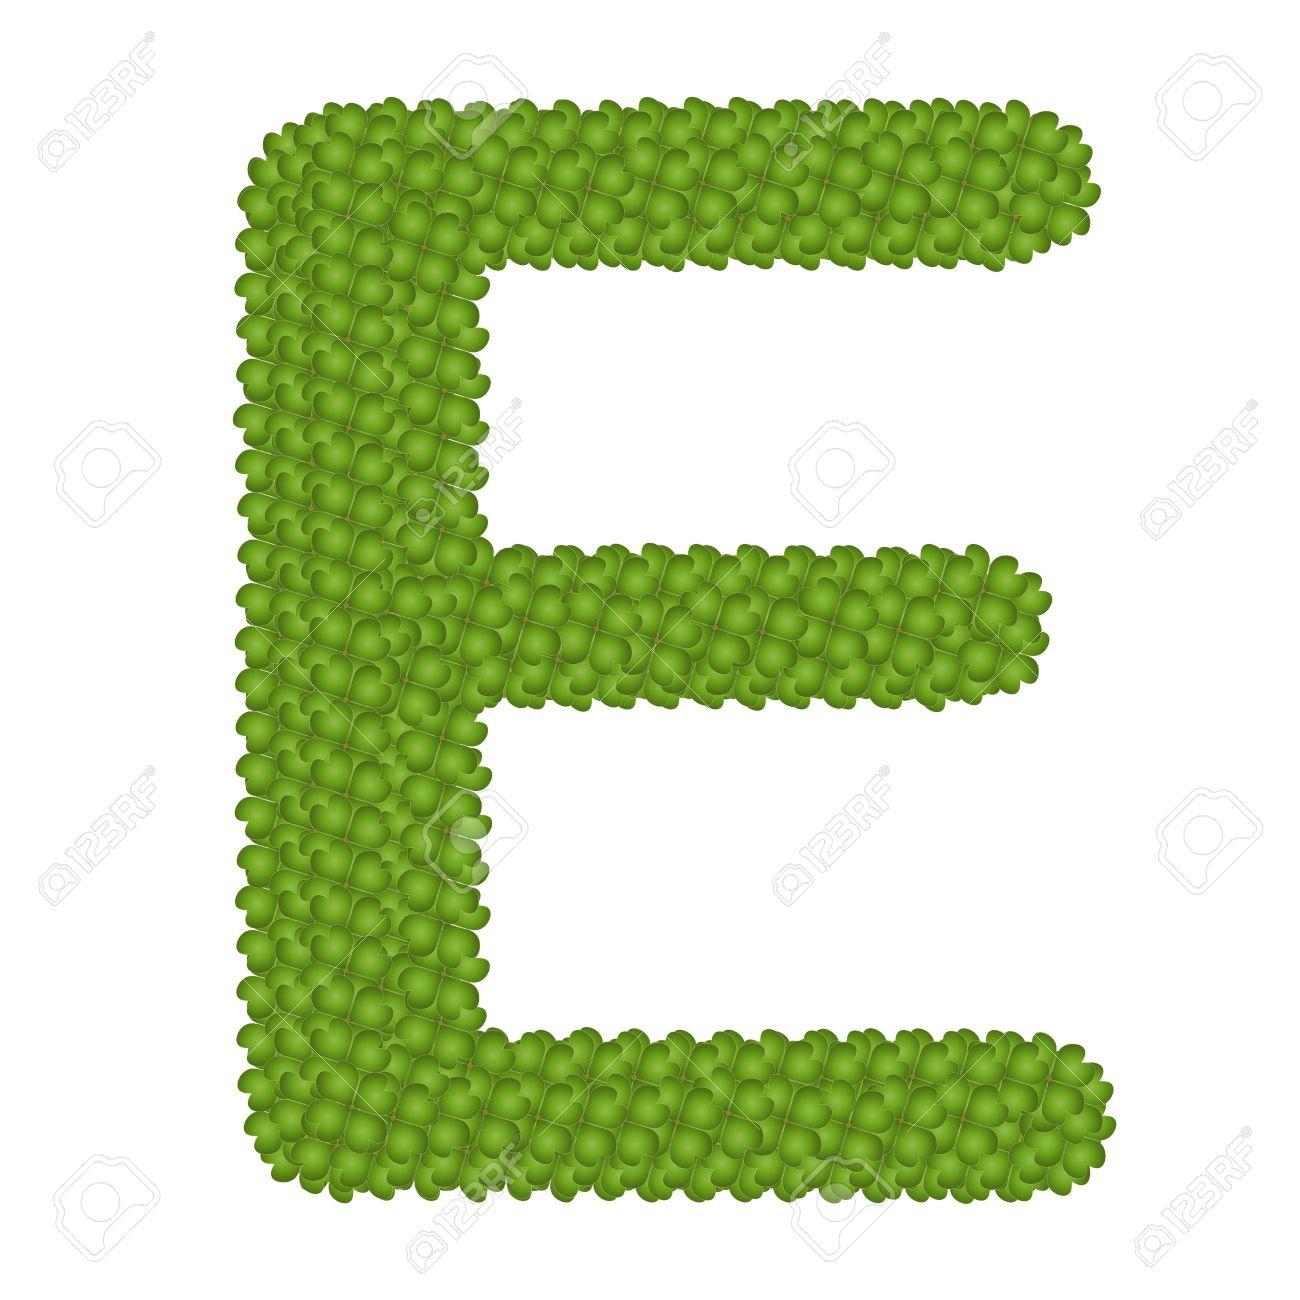 Letter e alphabet letters made of four leaf clover isolated stock letter e alphabet letters made of four leaf clover isolated on white background stock photo altavistaventures Images